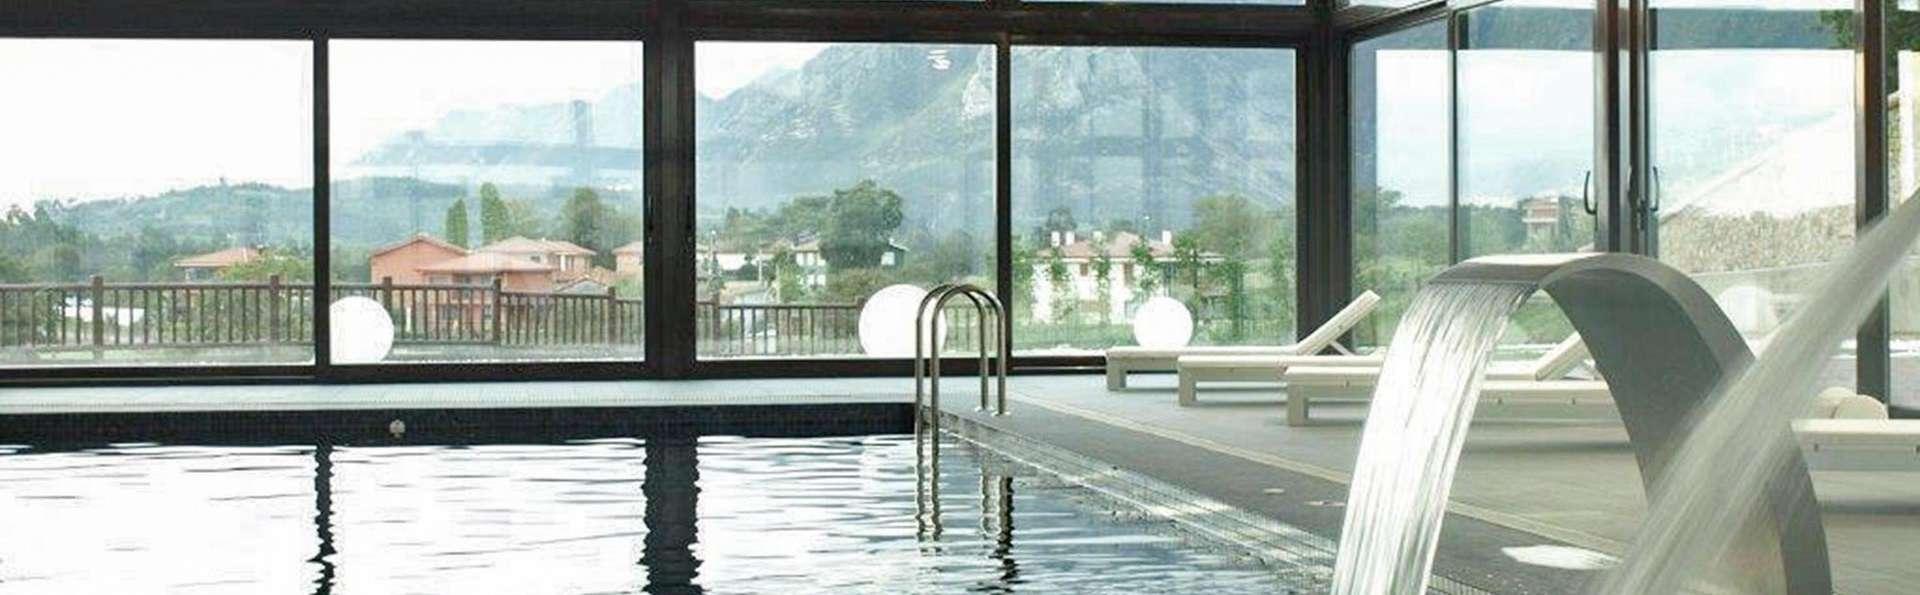 Hotel Spa La Piconera - EDIT_POOL_01.jpg